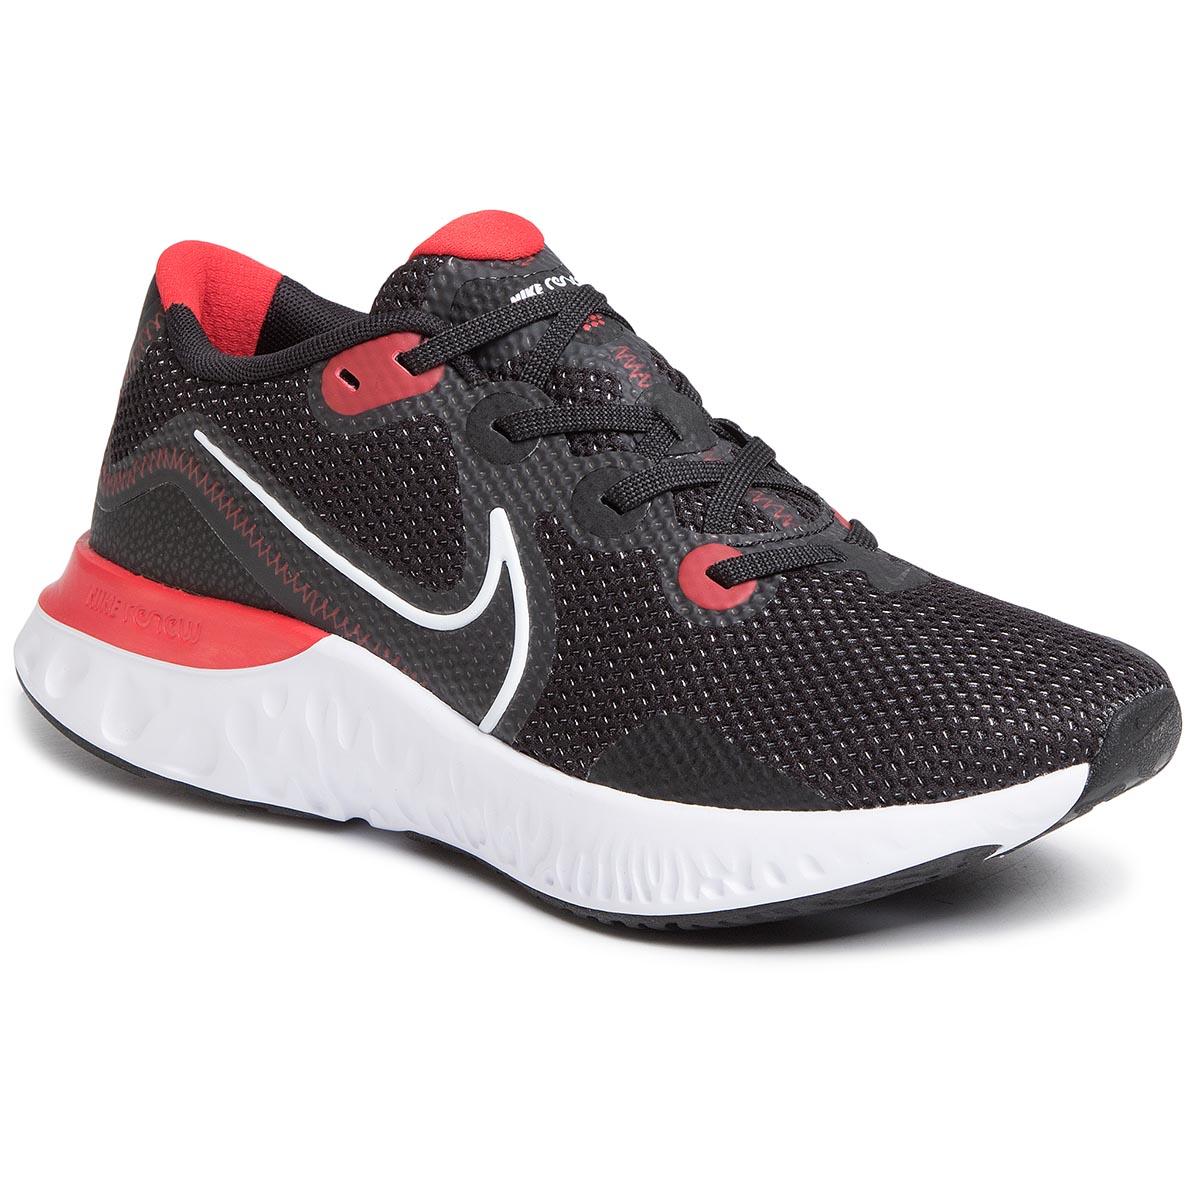 Topánky NIKE - Renew Run CK6357 005 Black/White/University Red